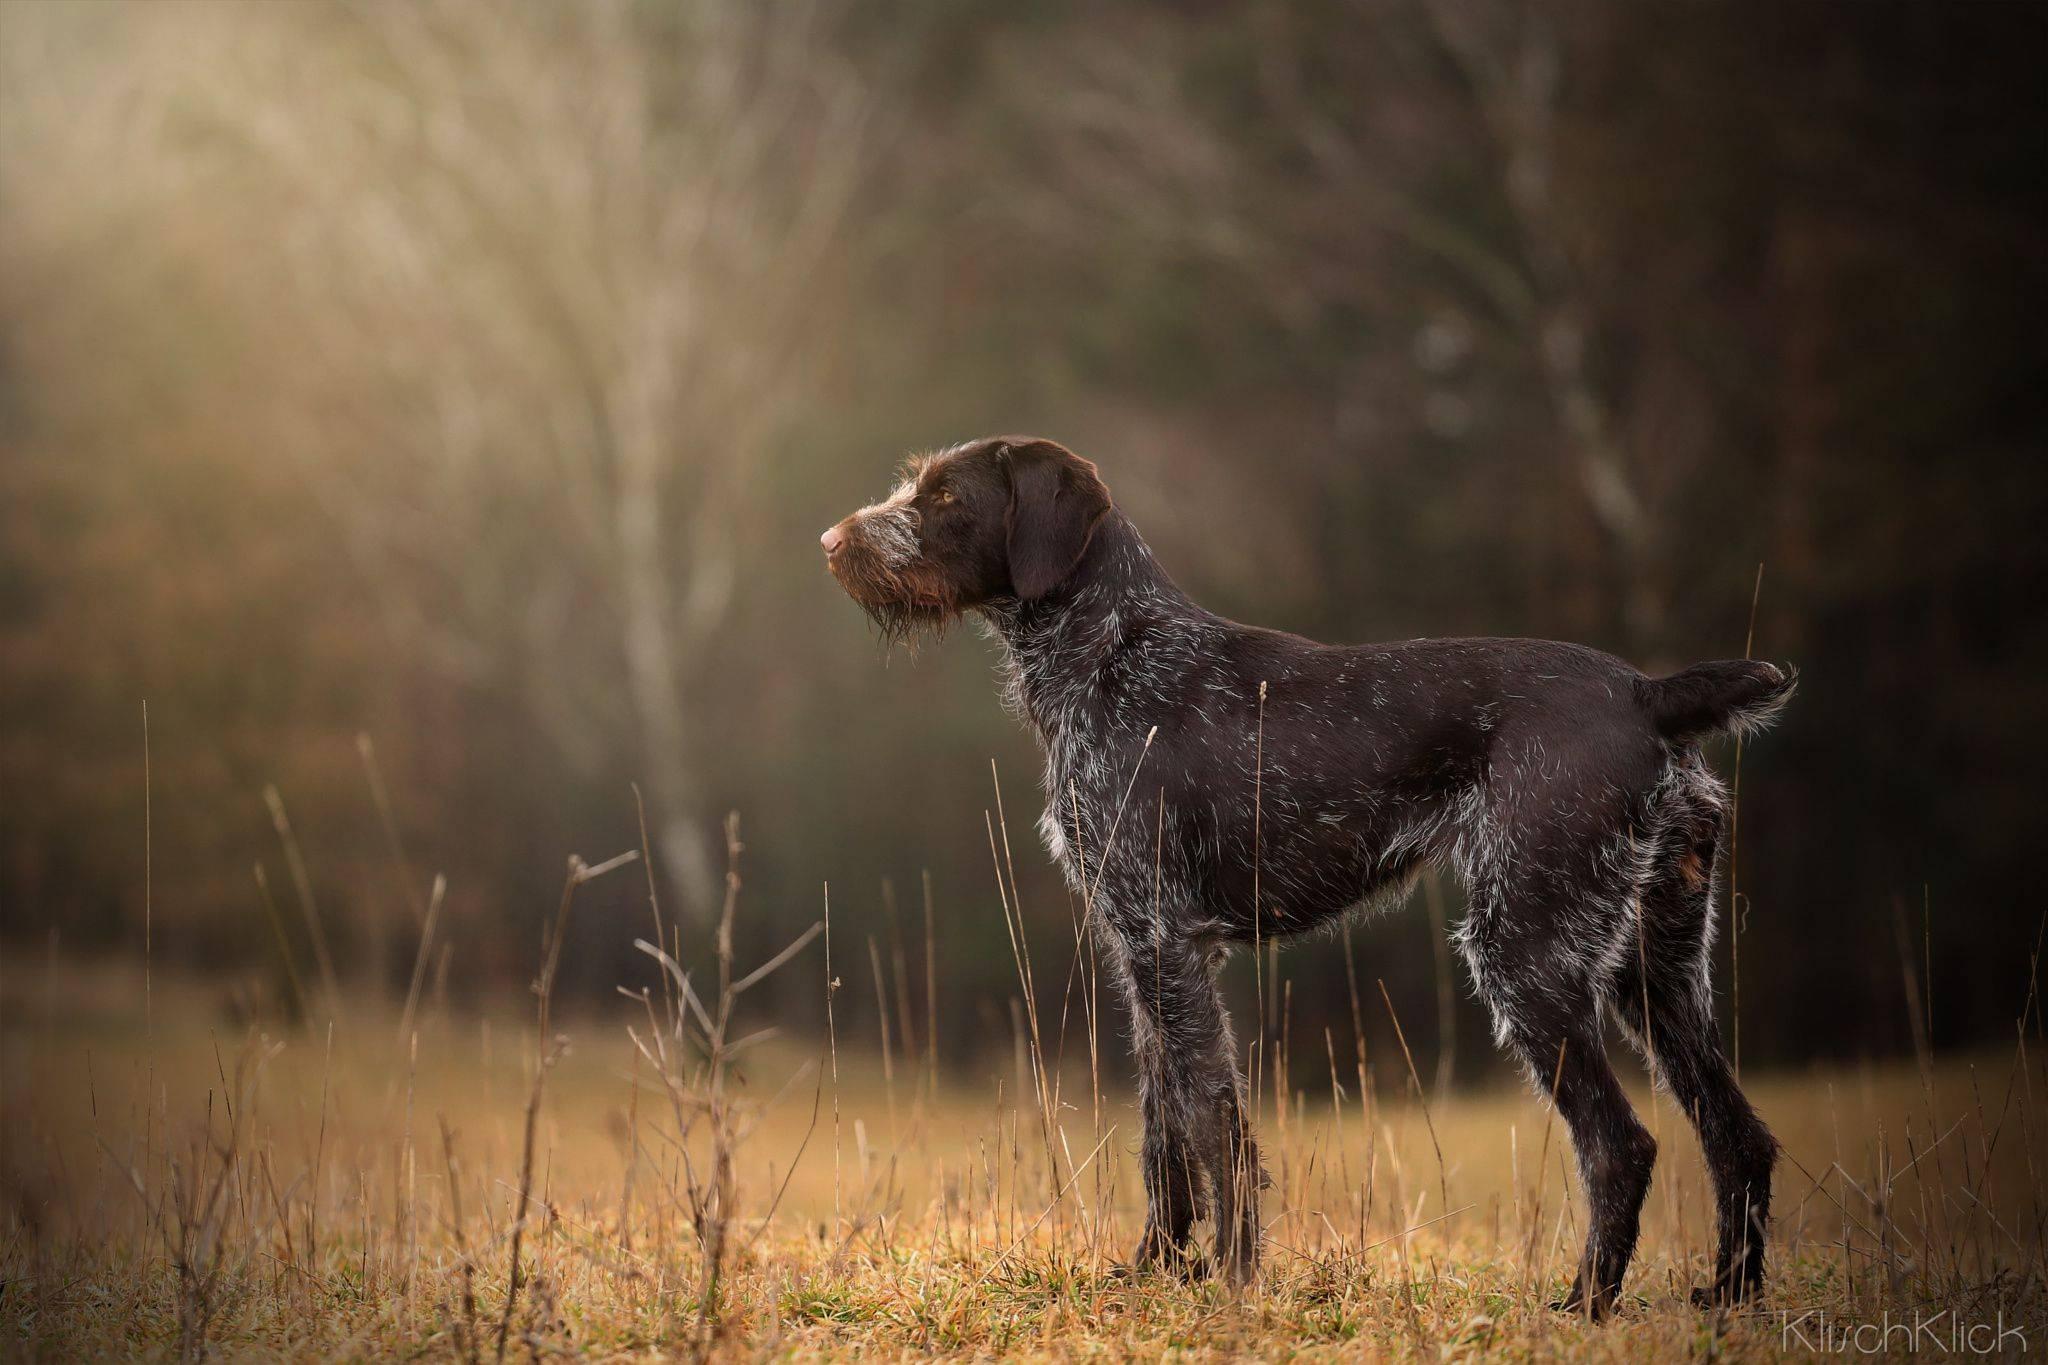 Дратхаар: описание породы собак, фото, характер